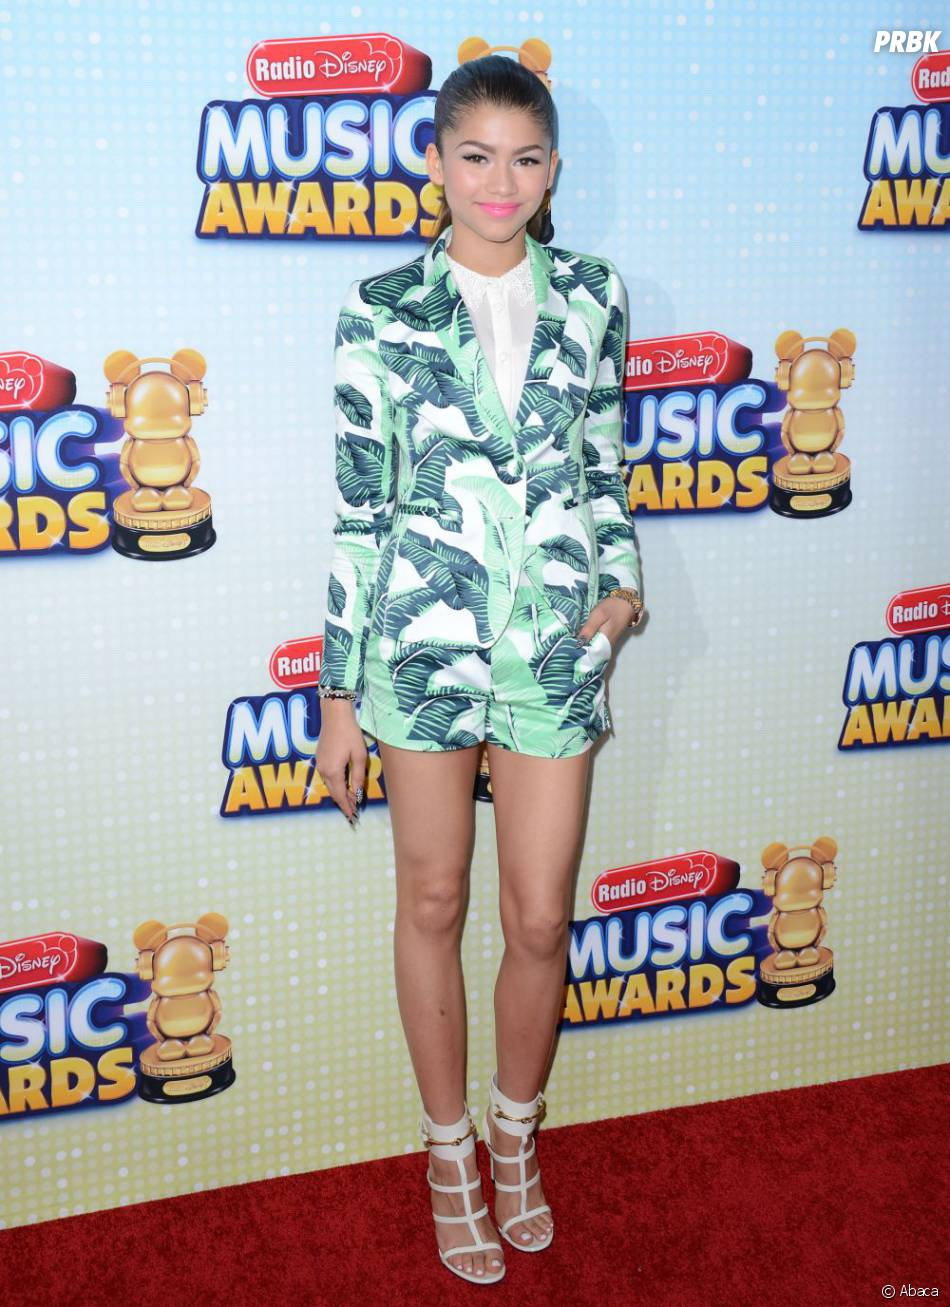 Zendaya Coleman, la star de Disney Channel, en micro-short aux Radio Disney Music Awards